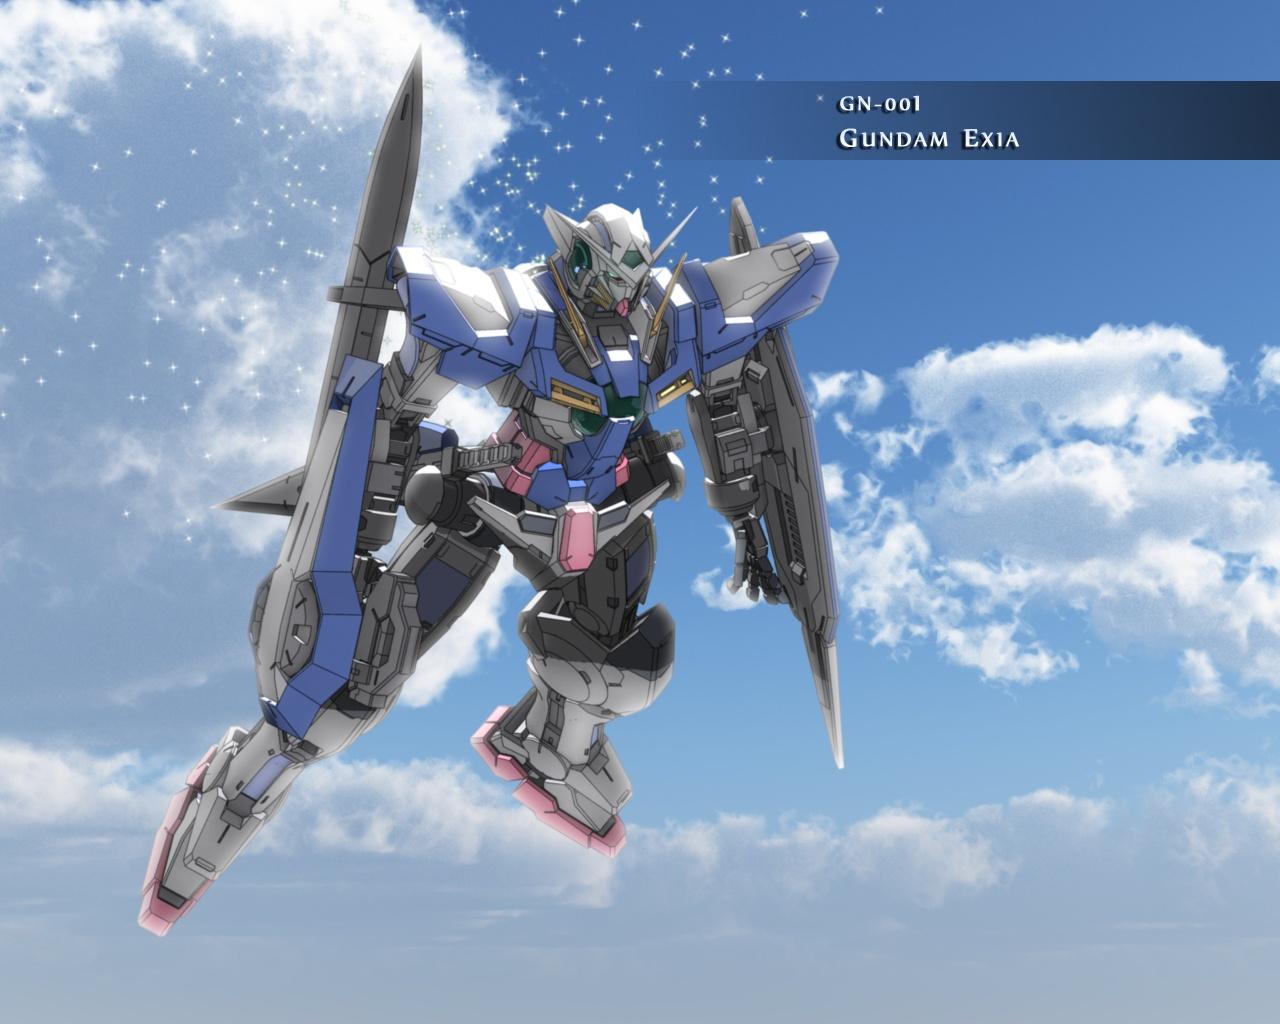 Prime Walls Gundam 00 Wallpapers 1280x1024